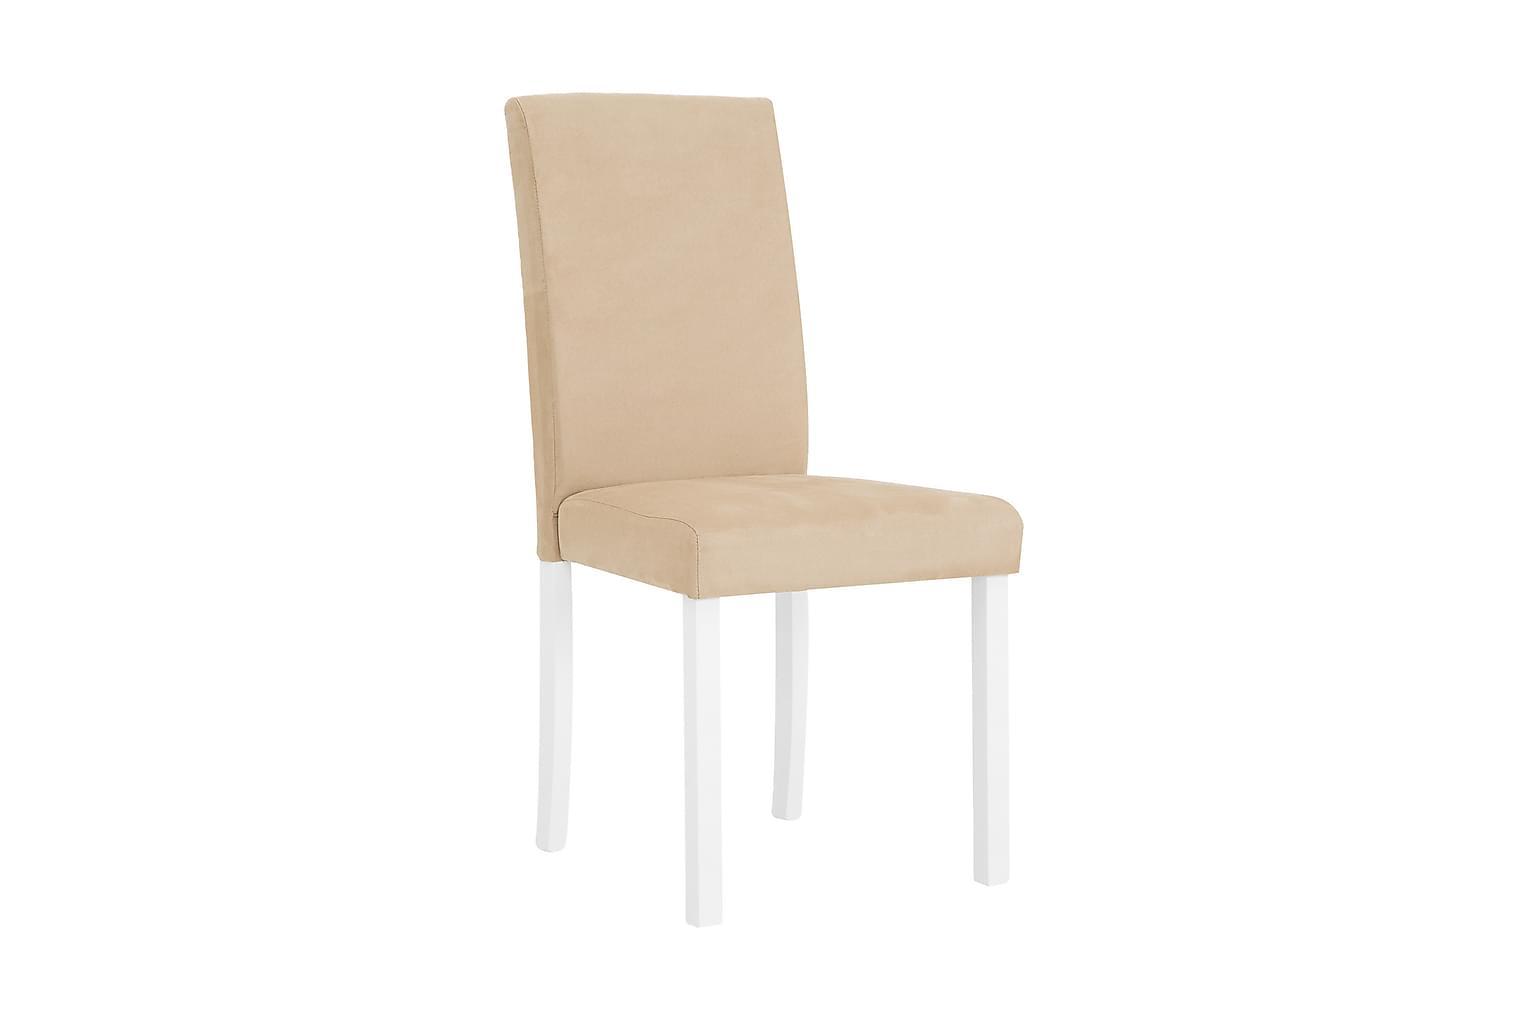 KUNGSBACKA Tuoli Beige/Valkoinen